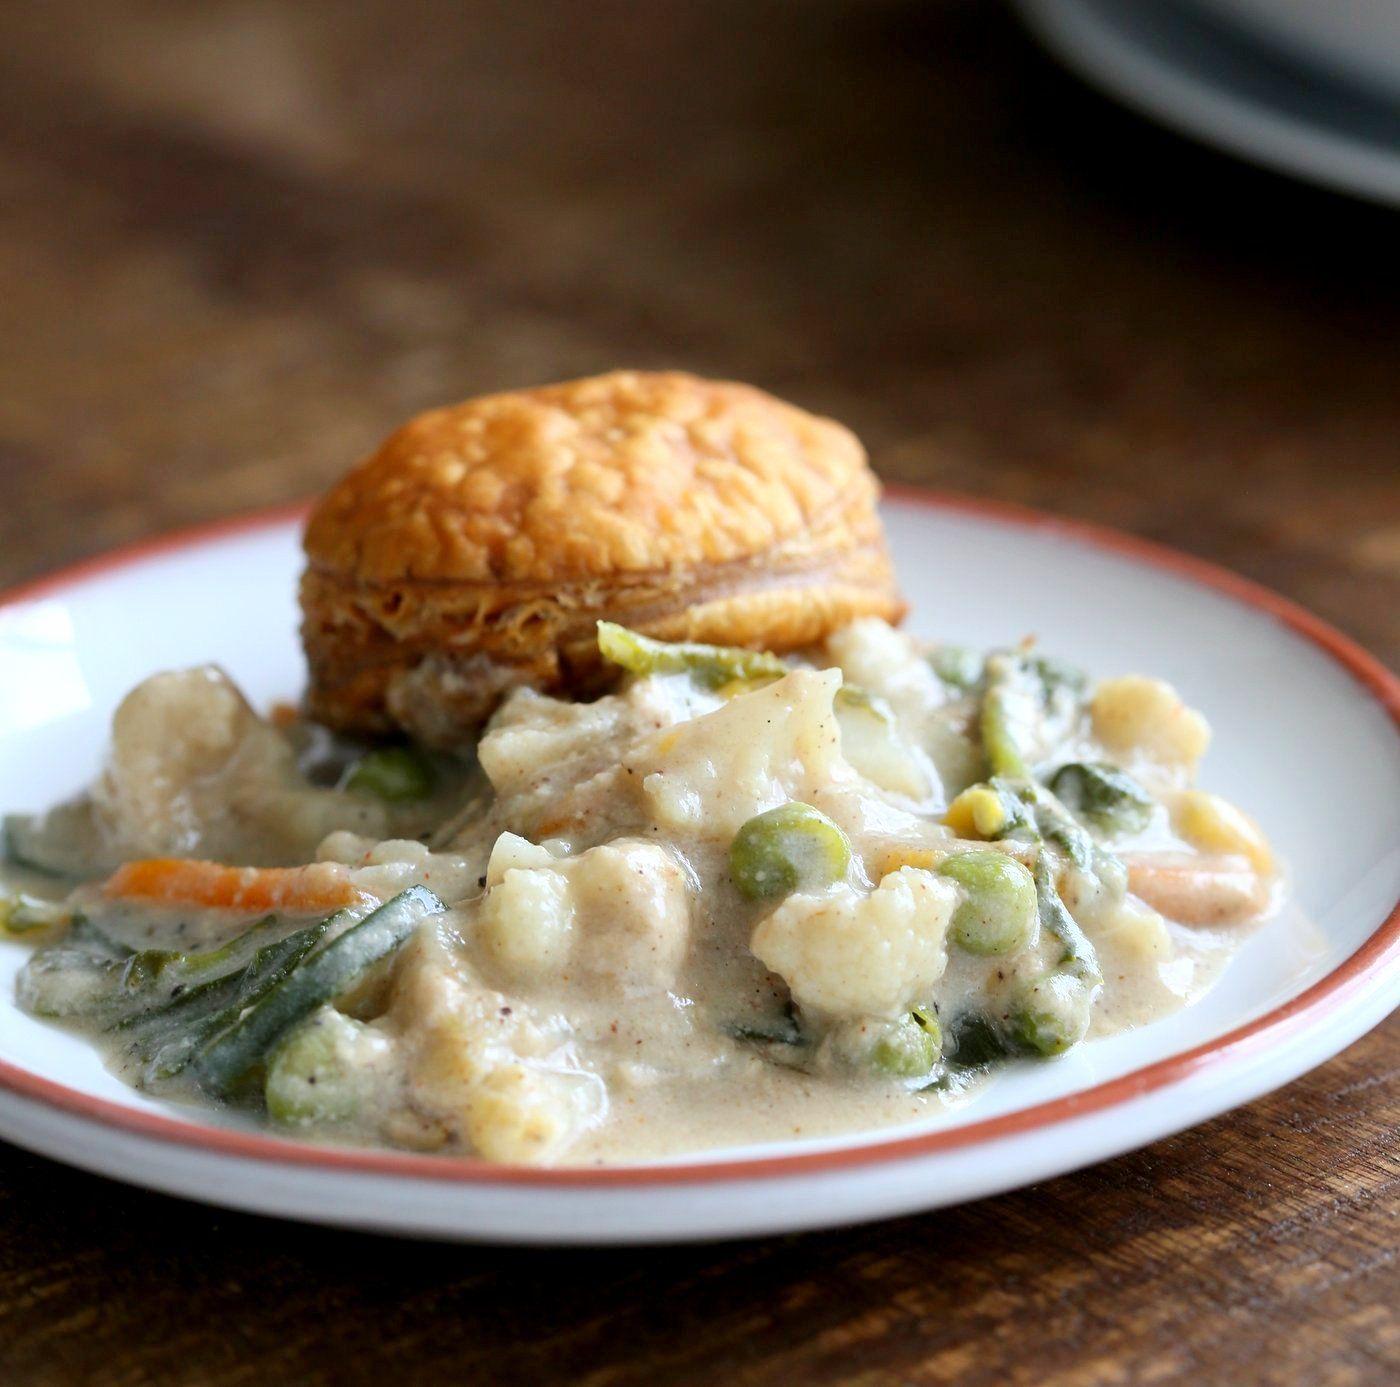 1 Hour Masala Vegetable Pot Pie Vegan Richa Recipe Vegetarian Pot Pie Vegetable Pot Pies Soy Free Recipes